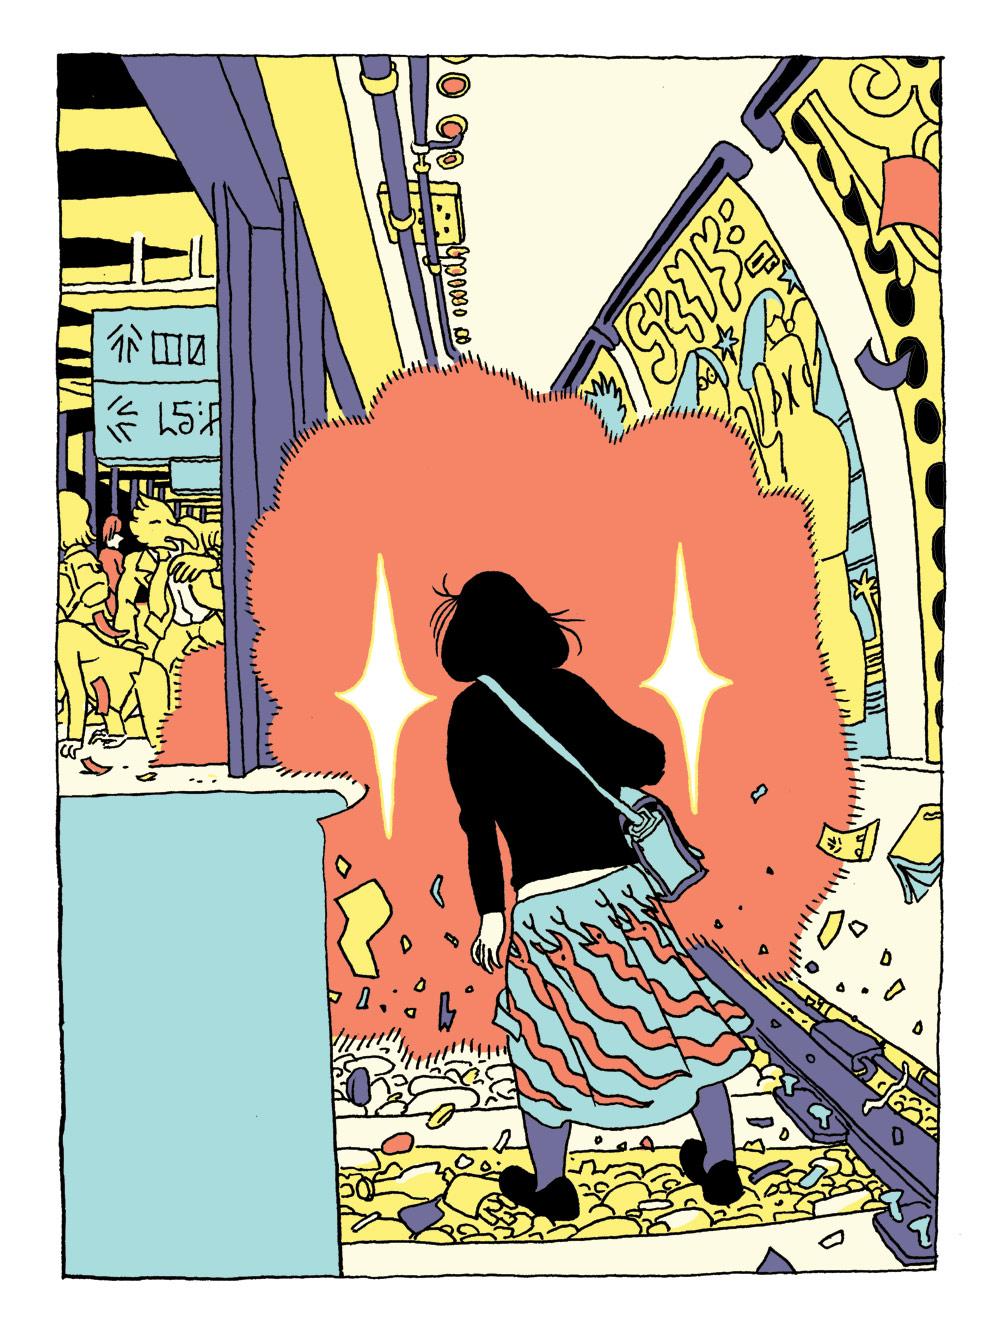 Illustrator Spotlight: Vincent Giard + Singeon Artes & contextos vincent giard singeon16